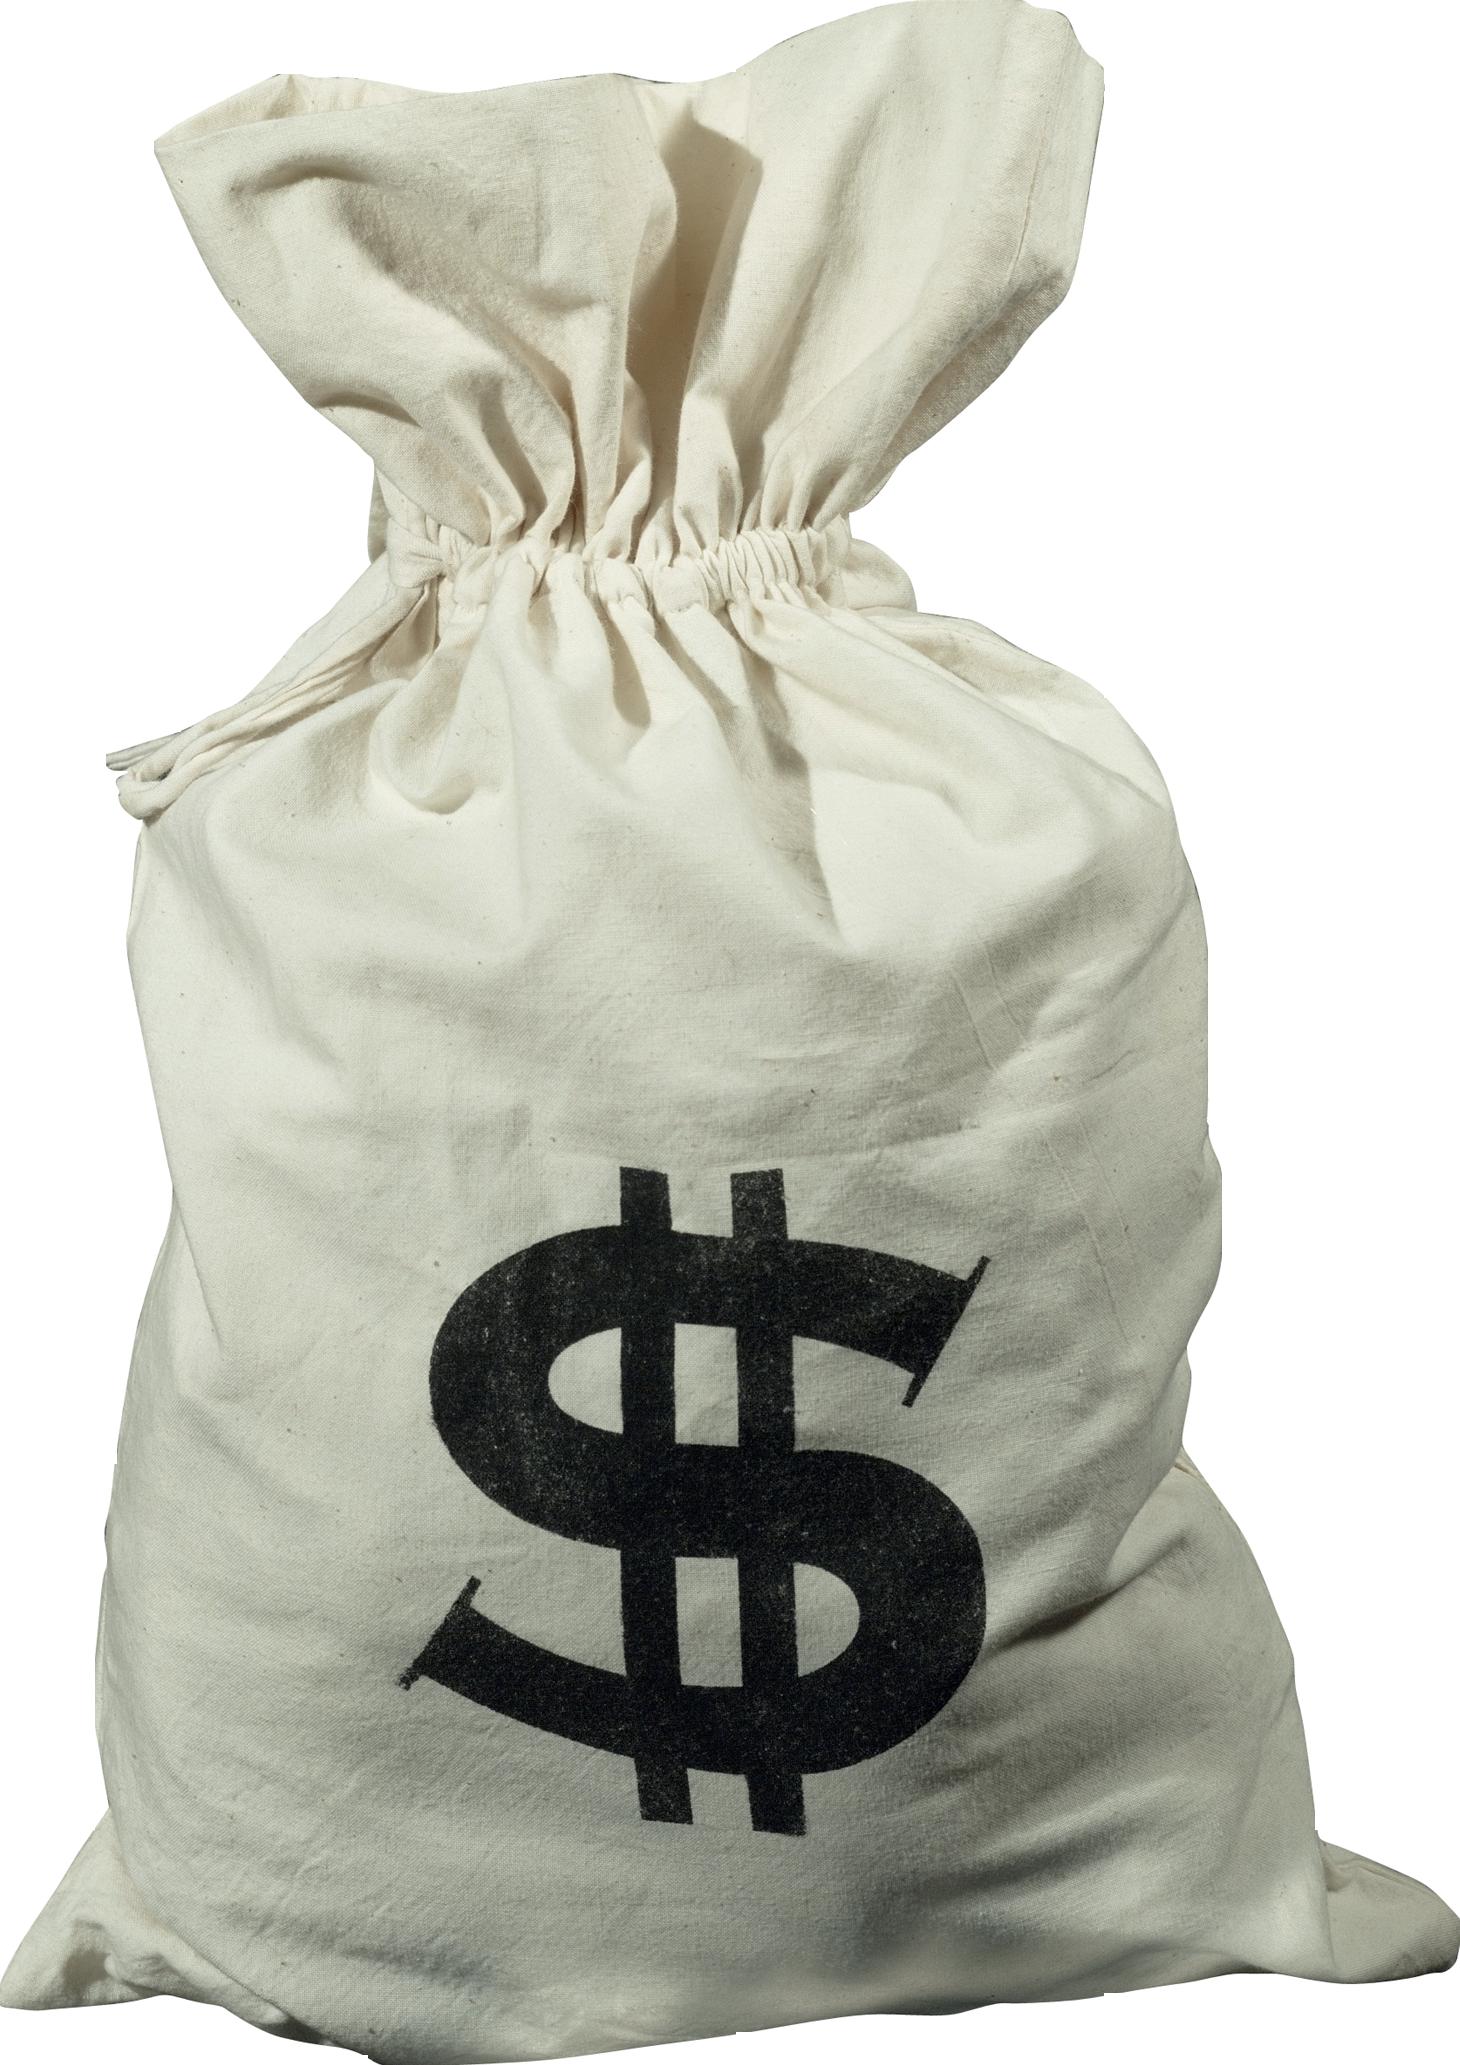 Money bag clipart transparent background svg free stock Money bag PNG image svg free stock